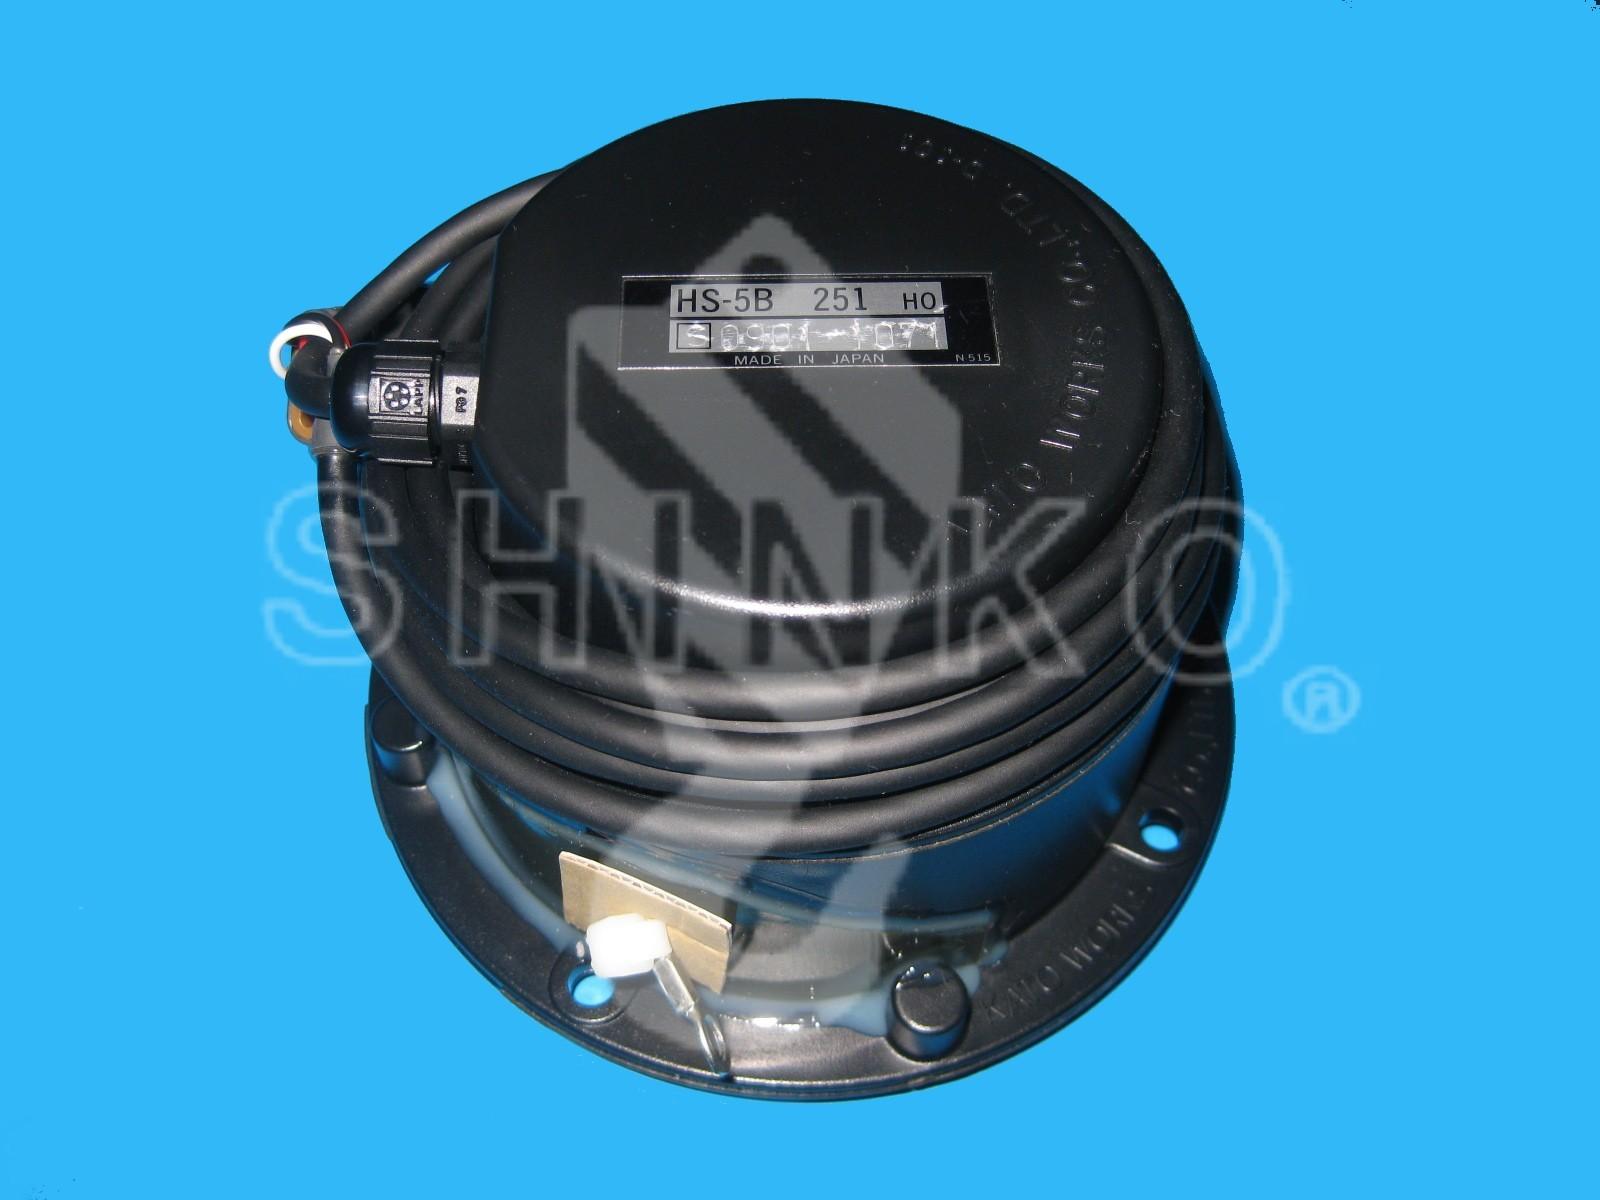 Stroke Sensor A